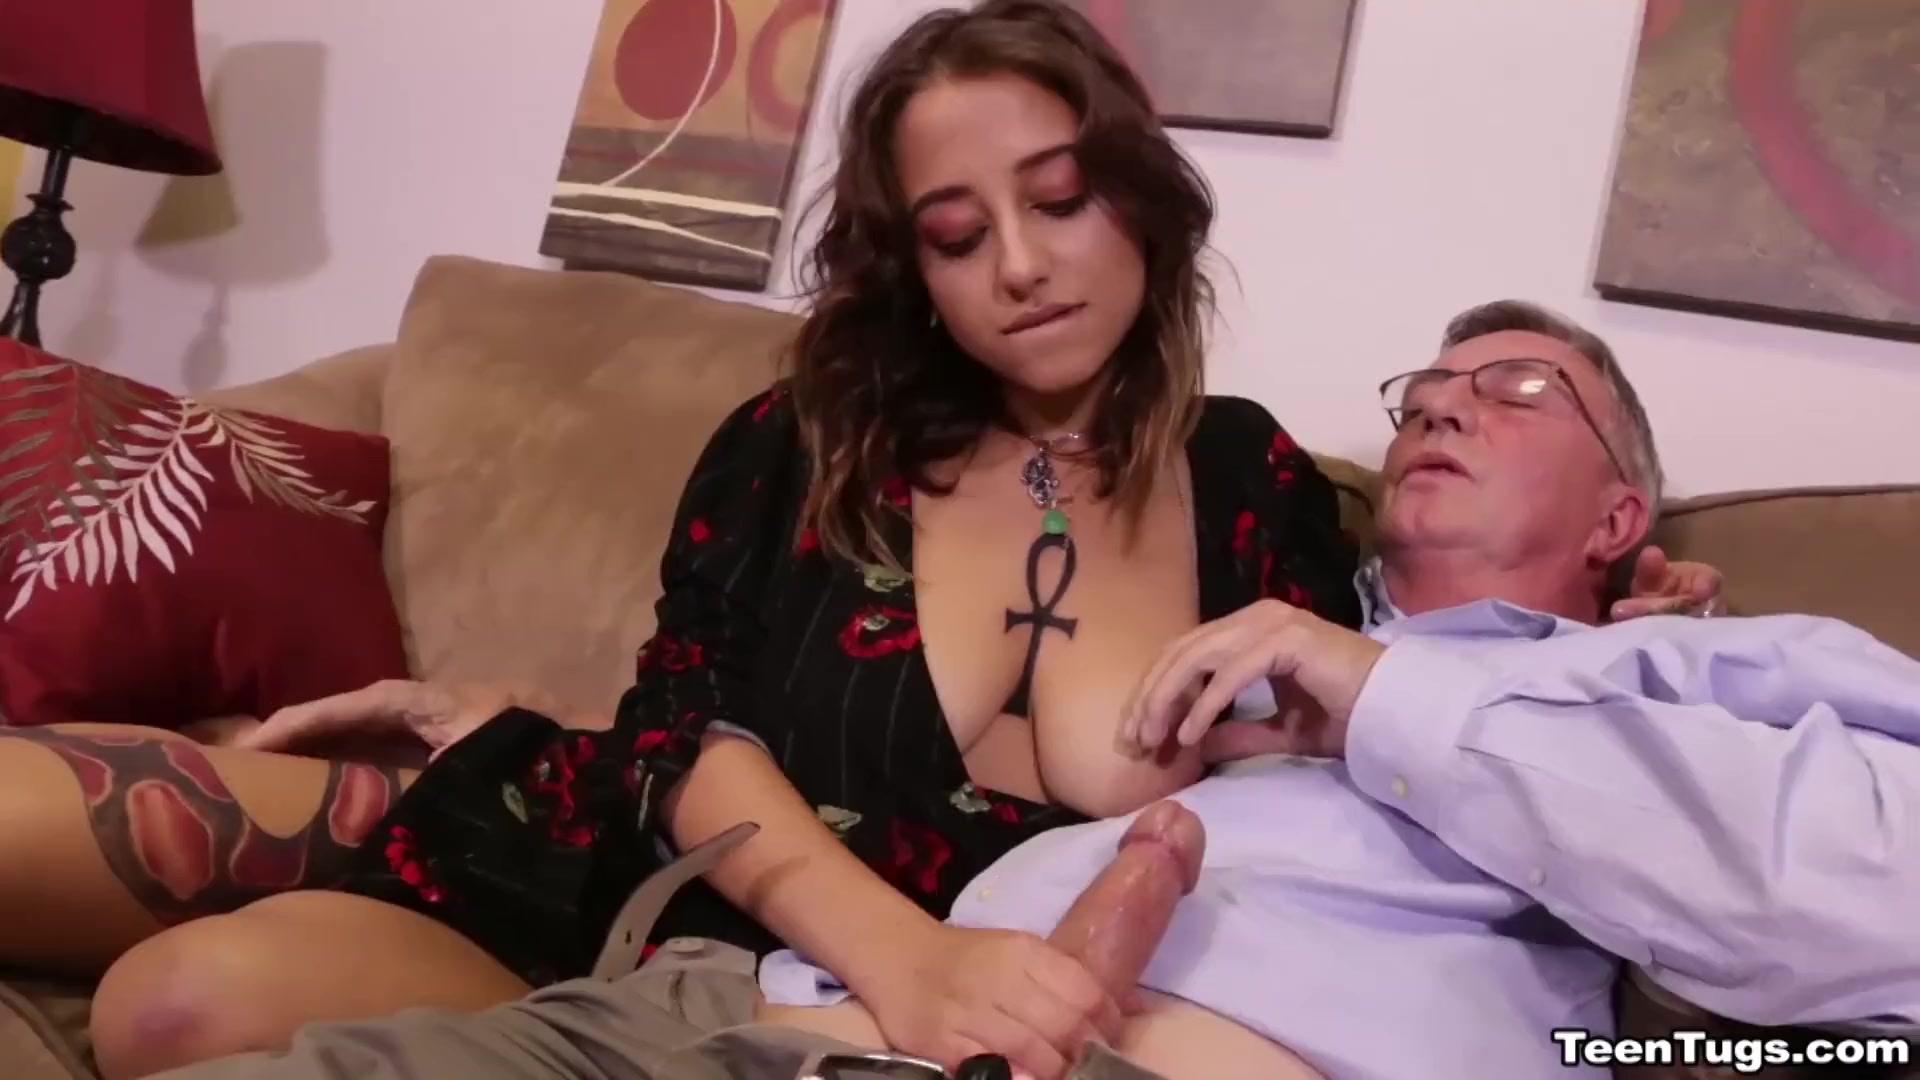 Women catching men jerking off